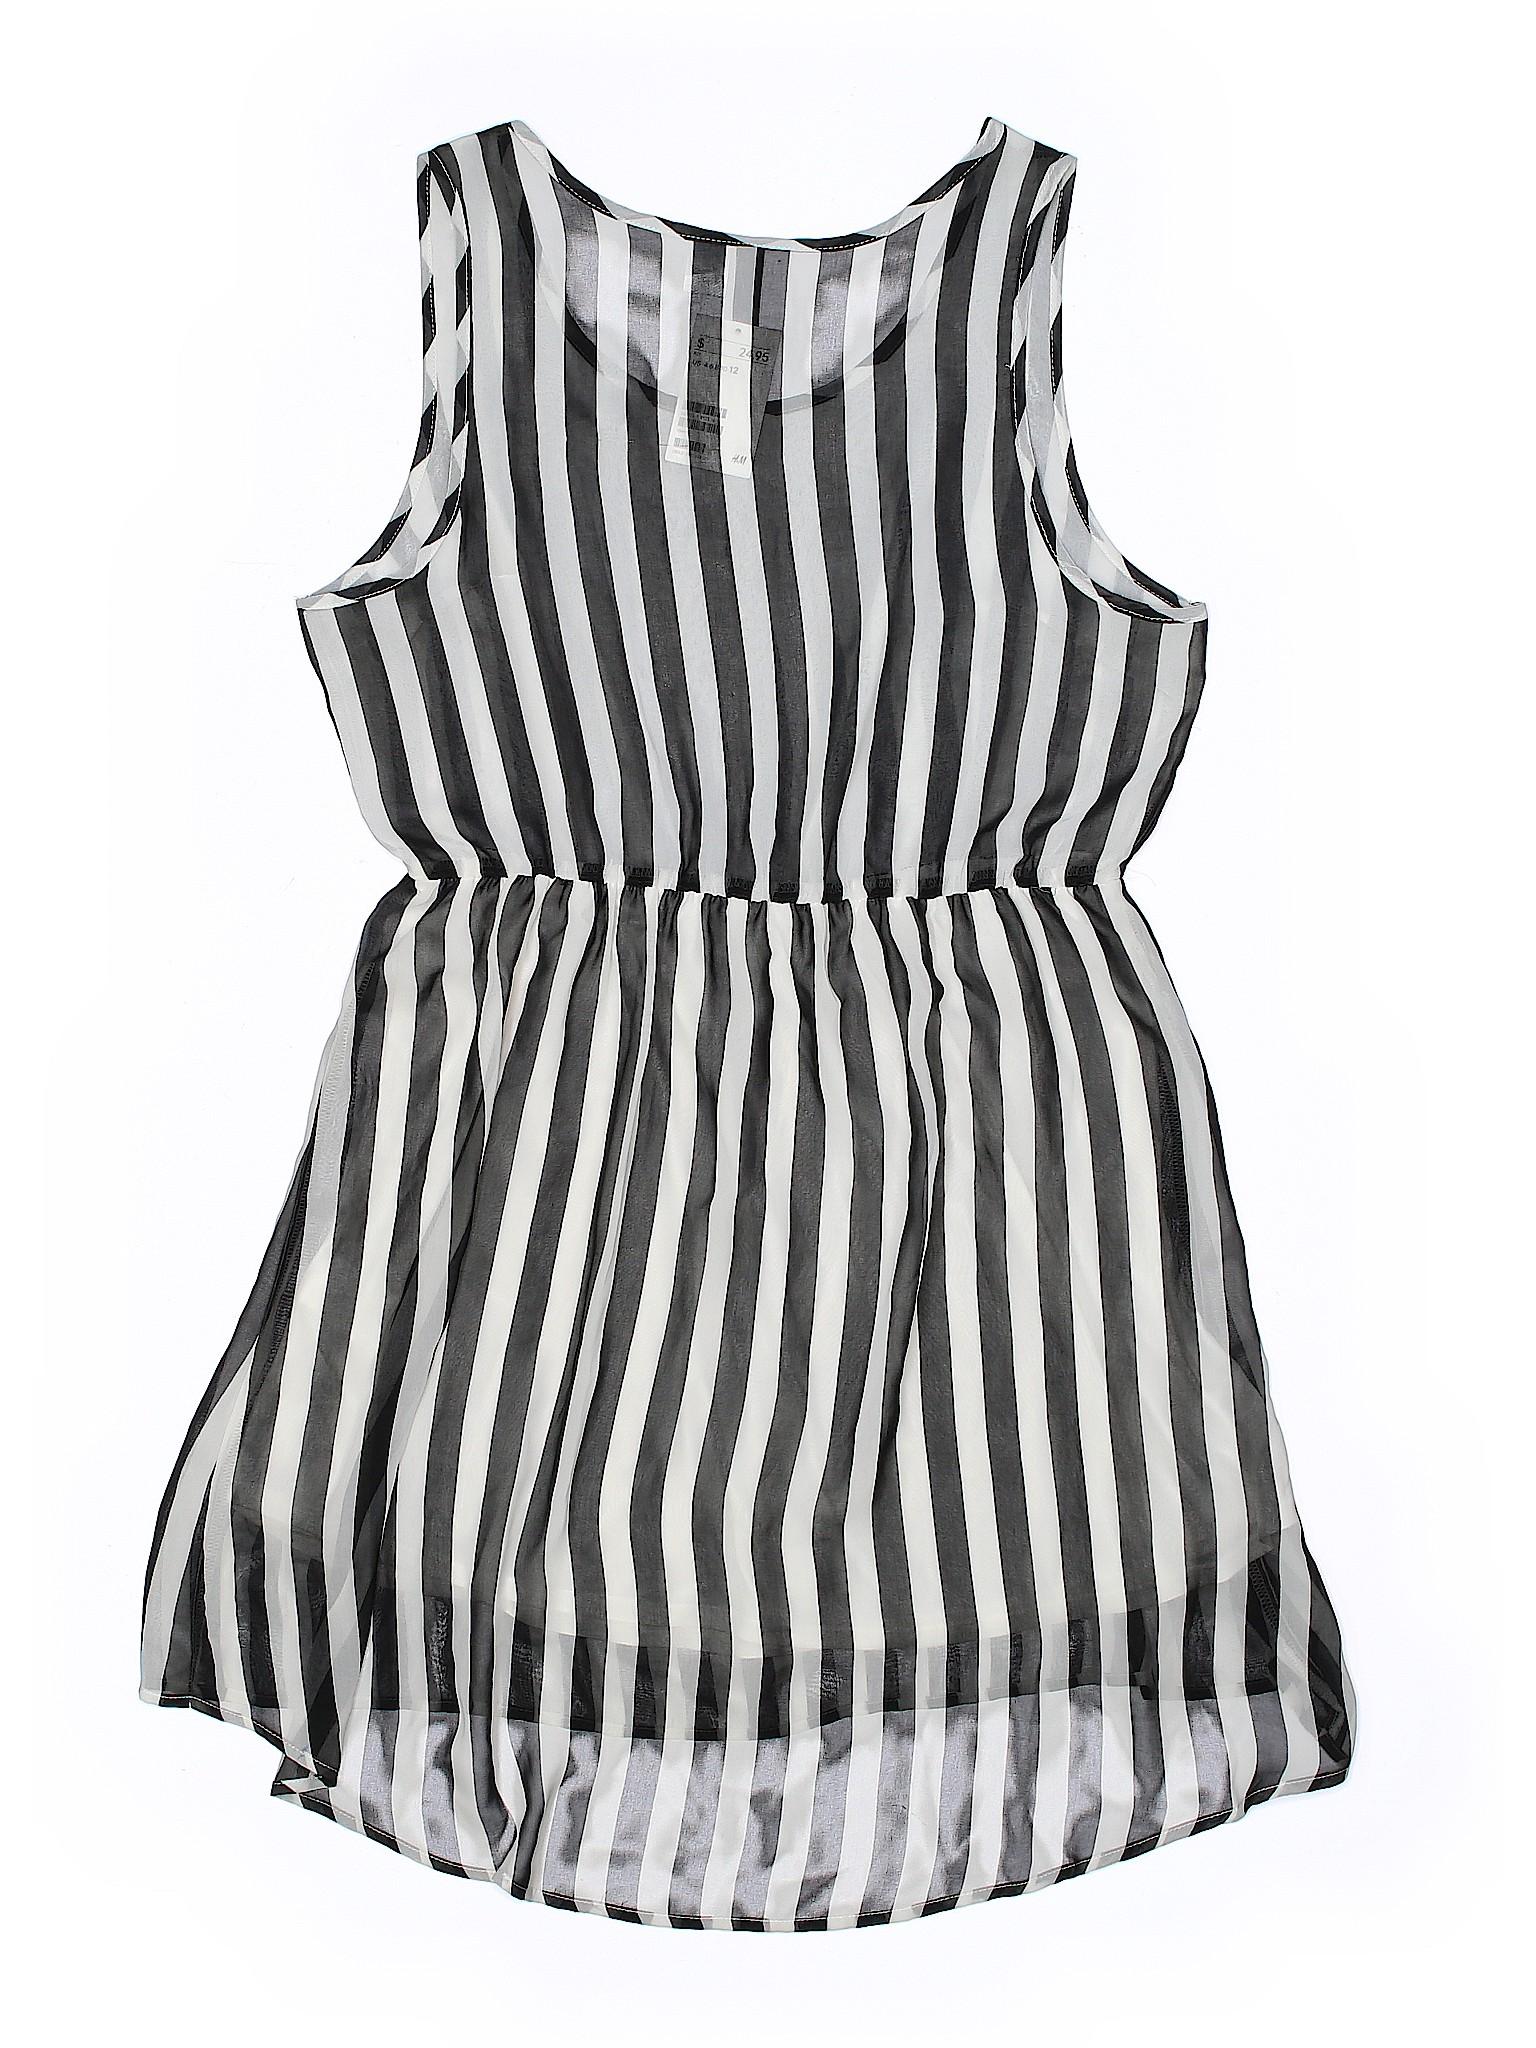 by H Casual winter Boutique Divided Dress amp;M fS4En0qx